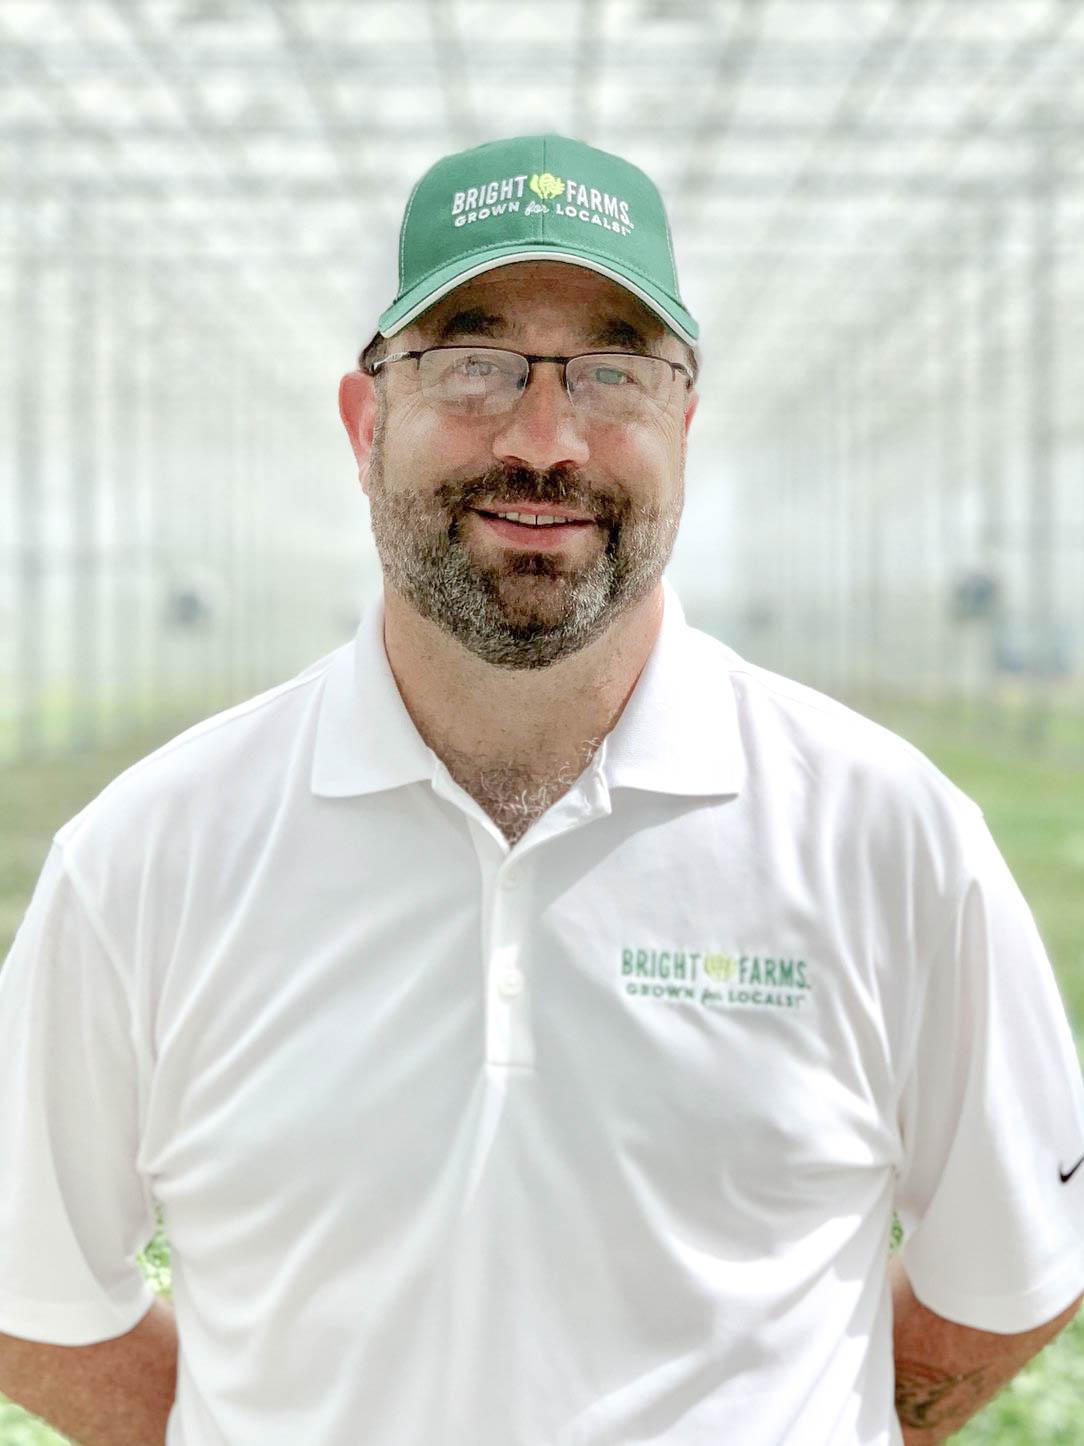 Tony Paar General Manager BrightFarms PEN Greenhouse